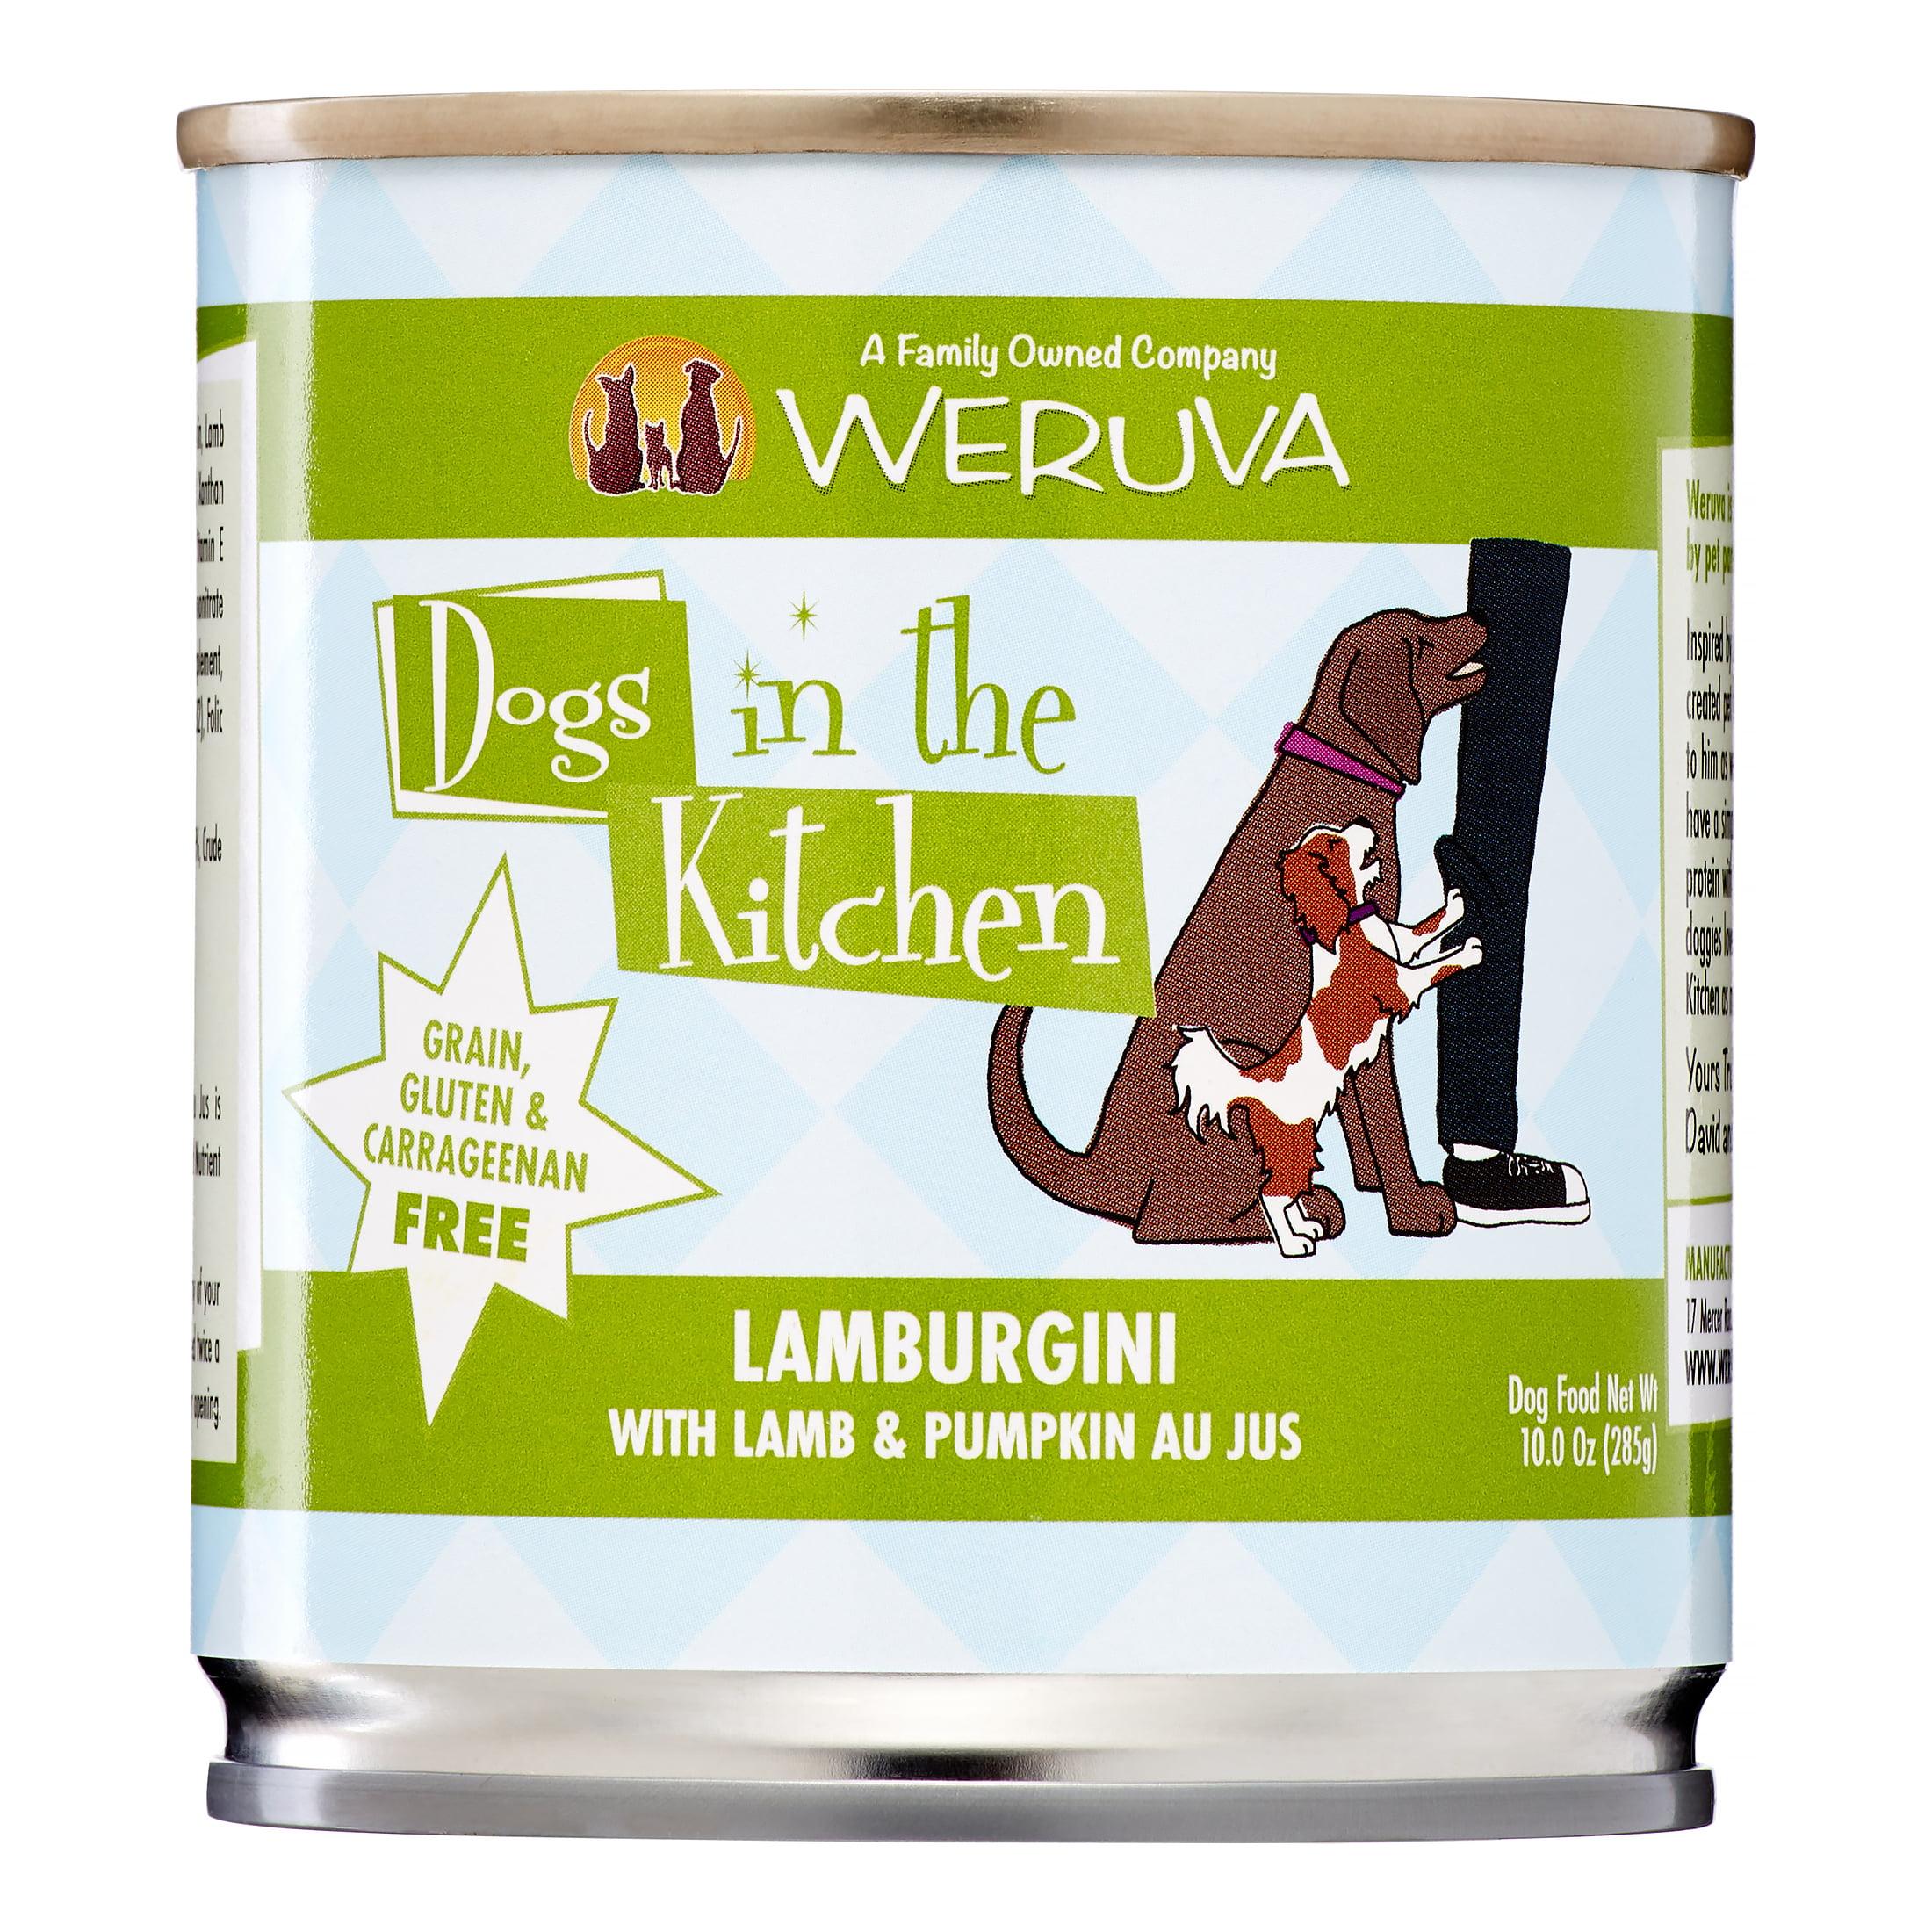 Weruva Dogs In The Kitchen Grain-Free Lamburgini Lamb